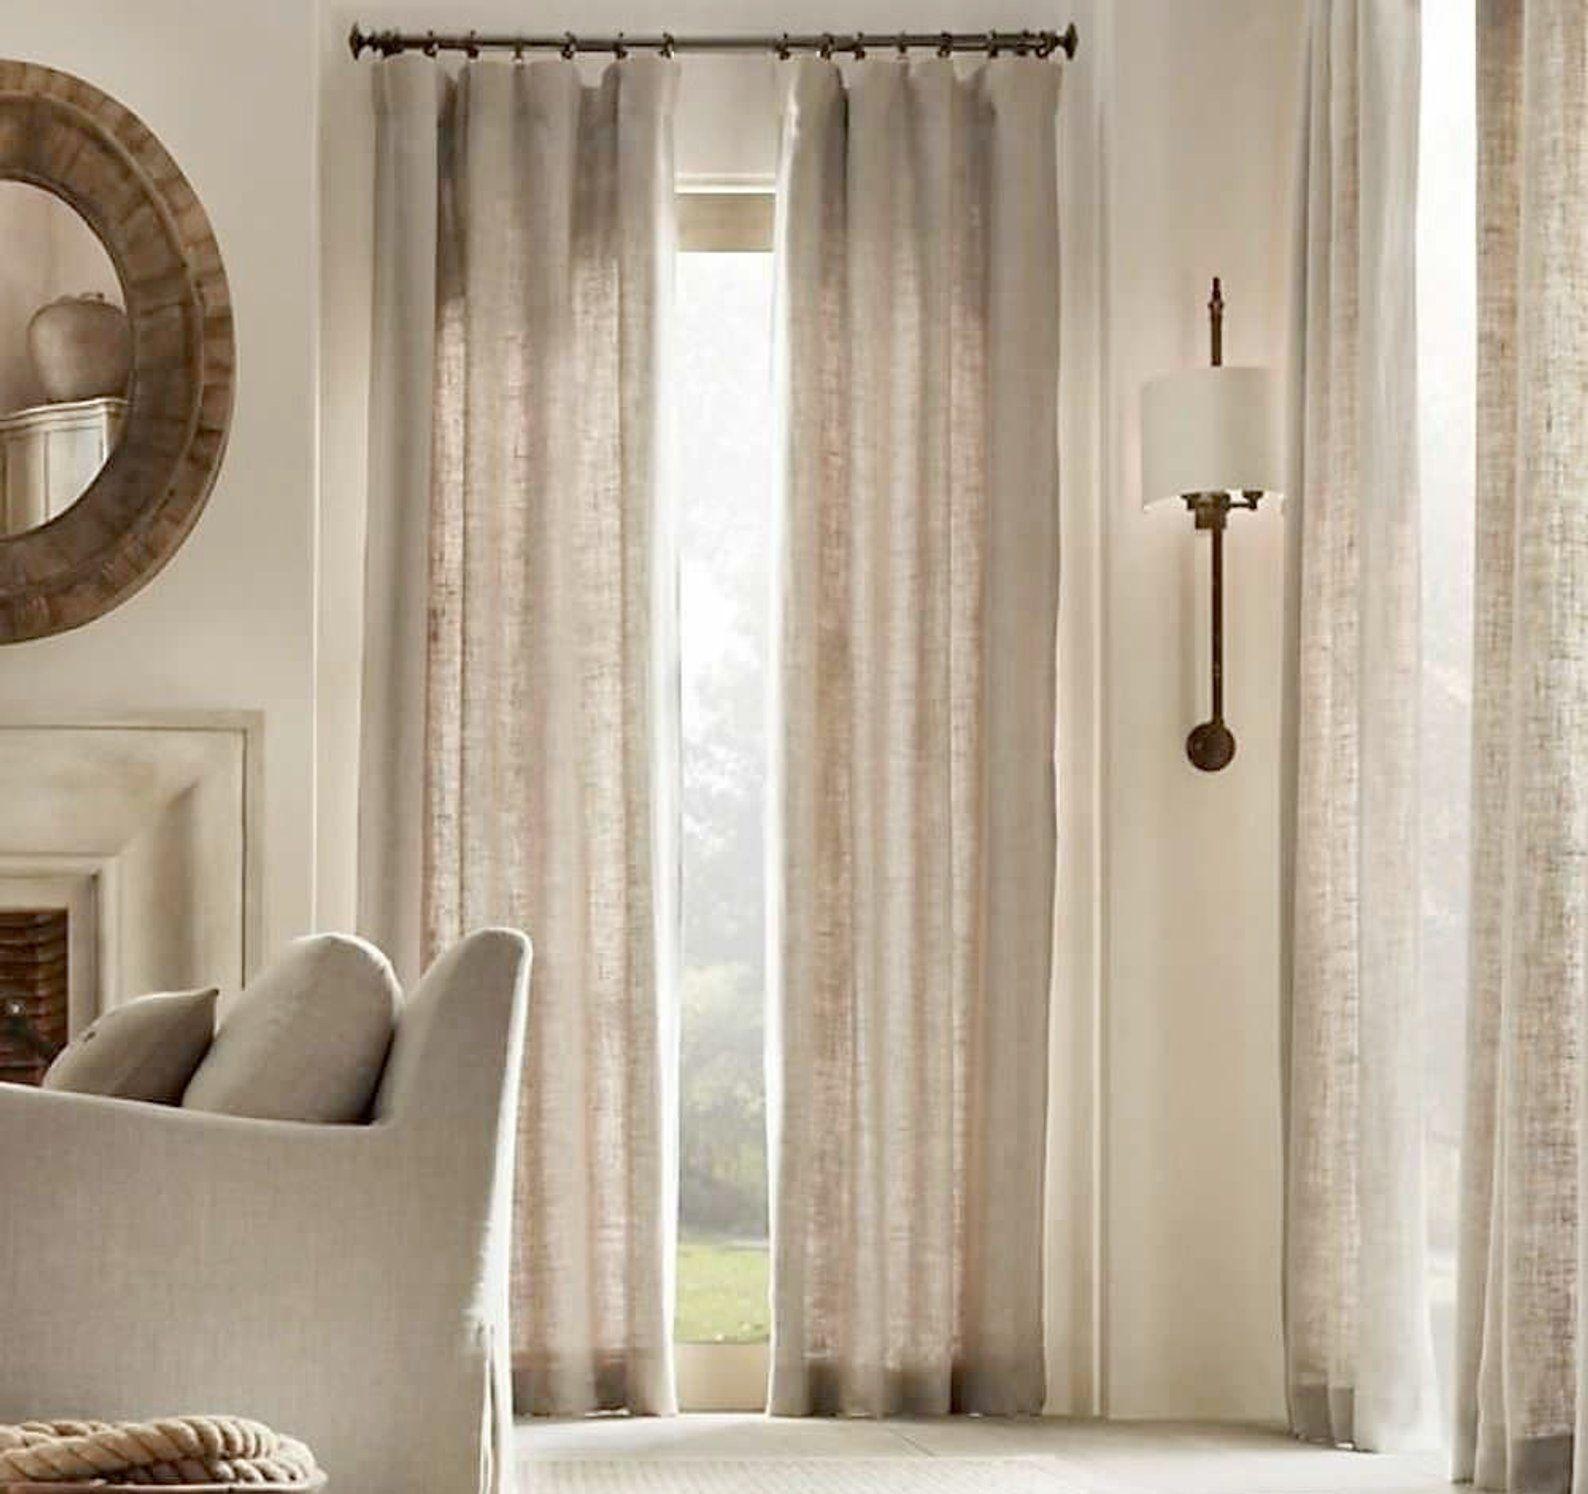 Natural Curtains Linen Curtains Farmhouse Curtains Living Room